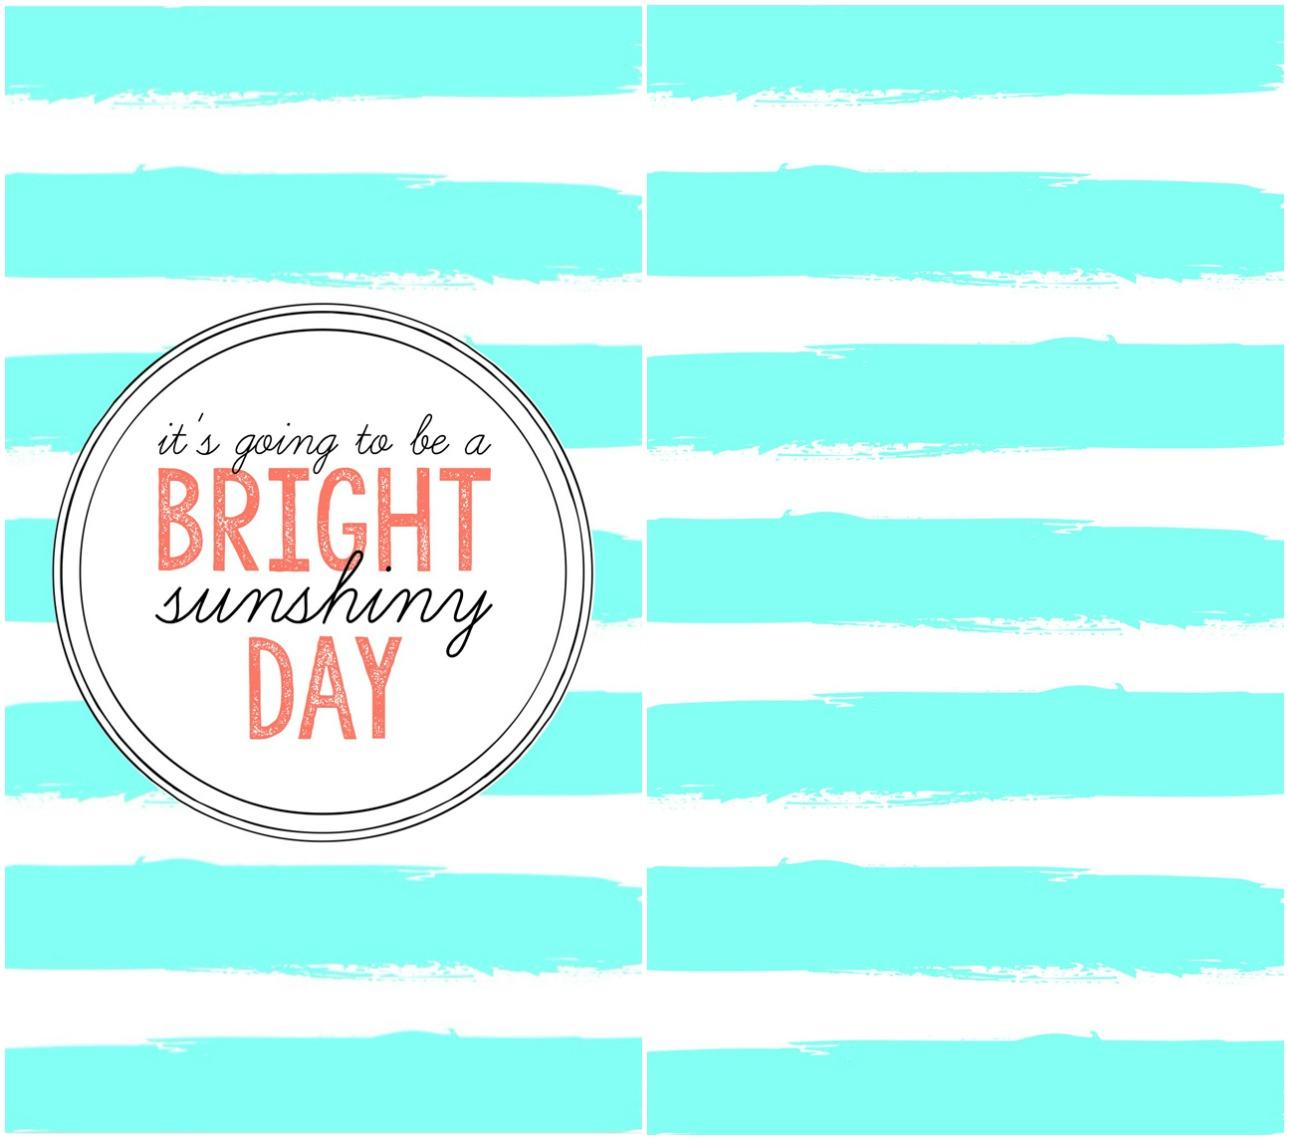 Bright Sunshiny Day Phone Wallpaper 1289x1140